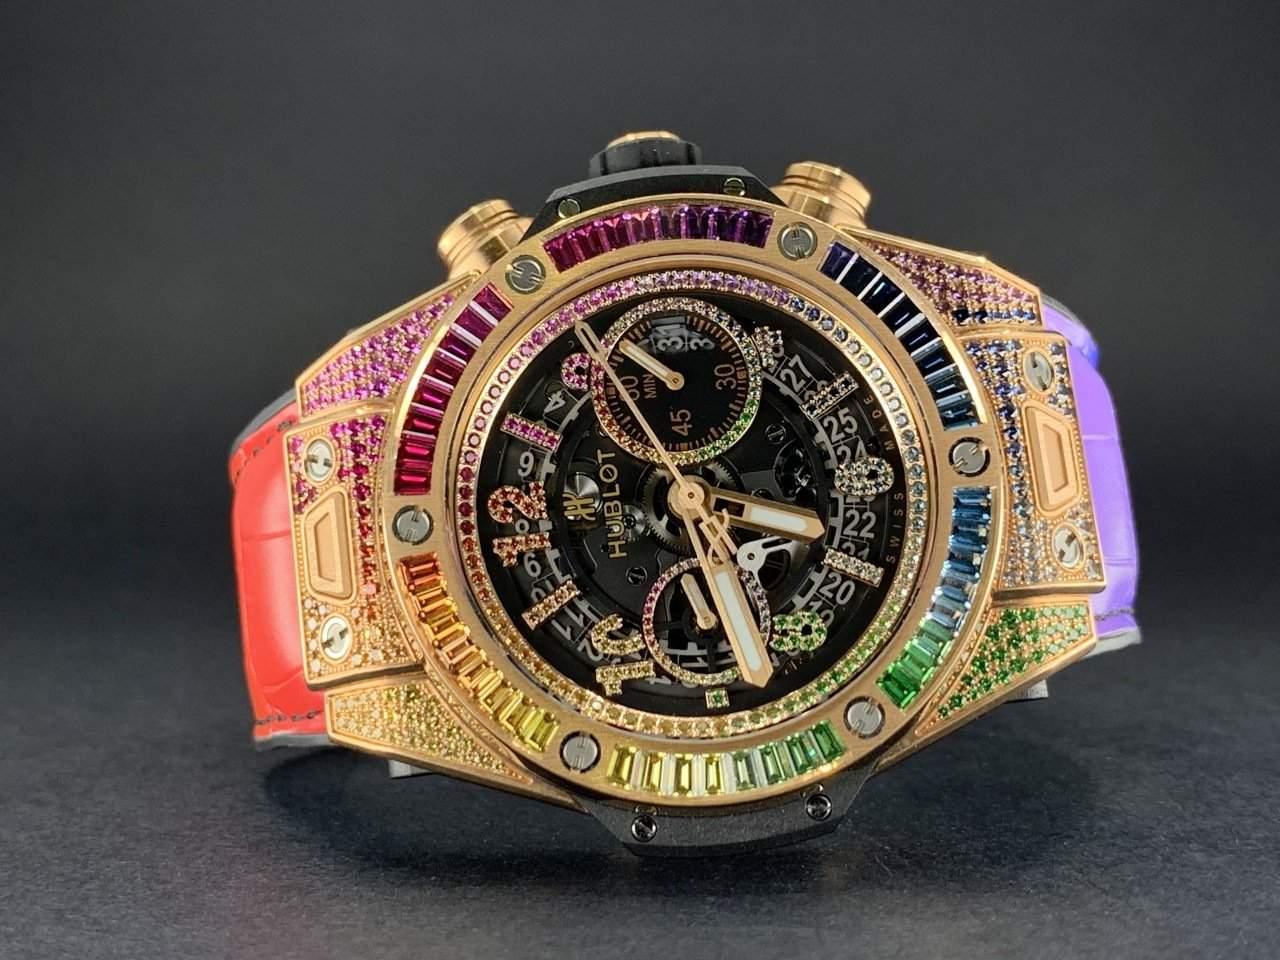 Shiny and extravagant: Kylian Mbappé's Hublot Big Bang King Gold Rainbow